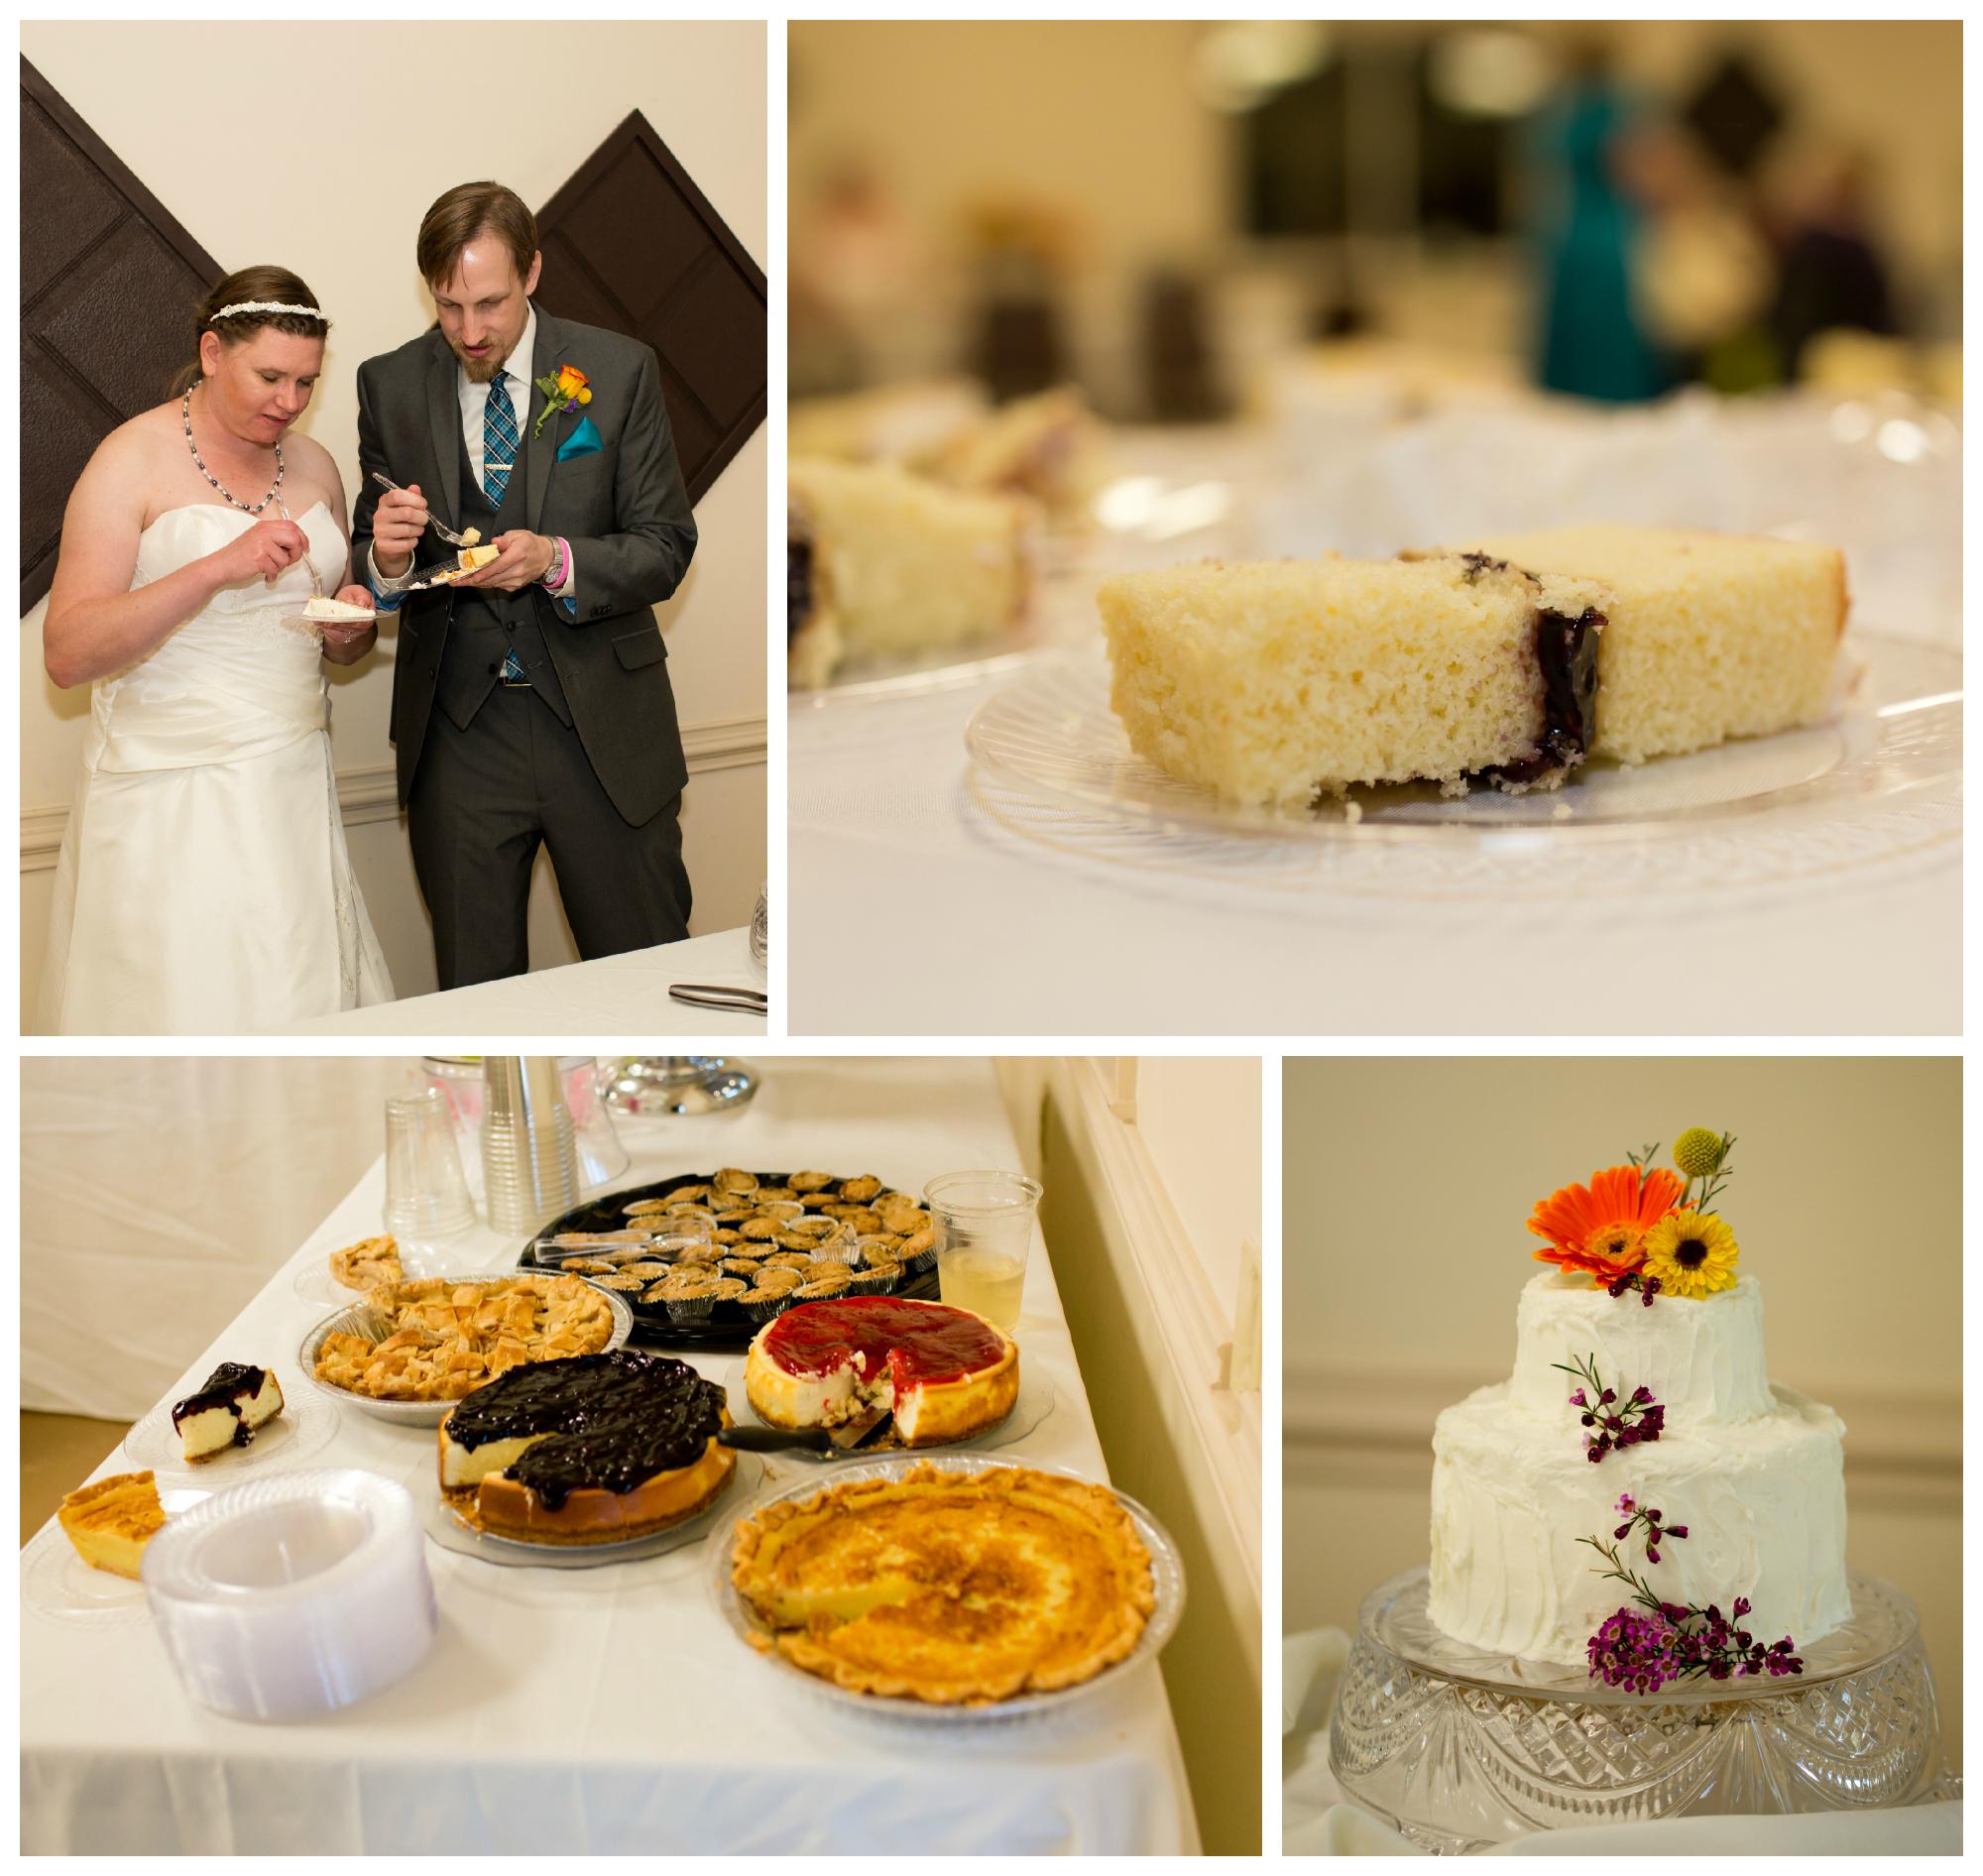 wedding cake, pie, dessert table